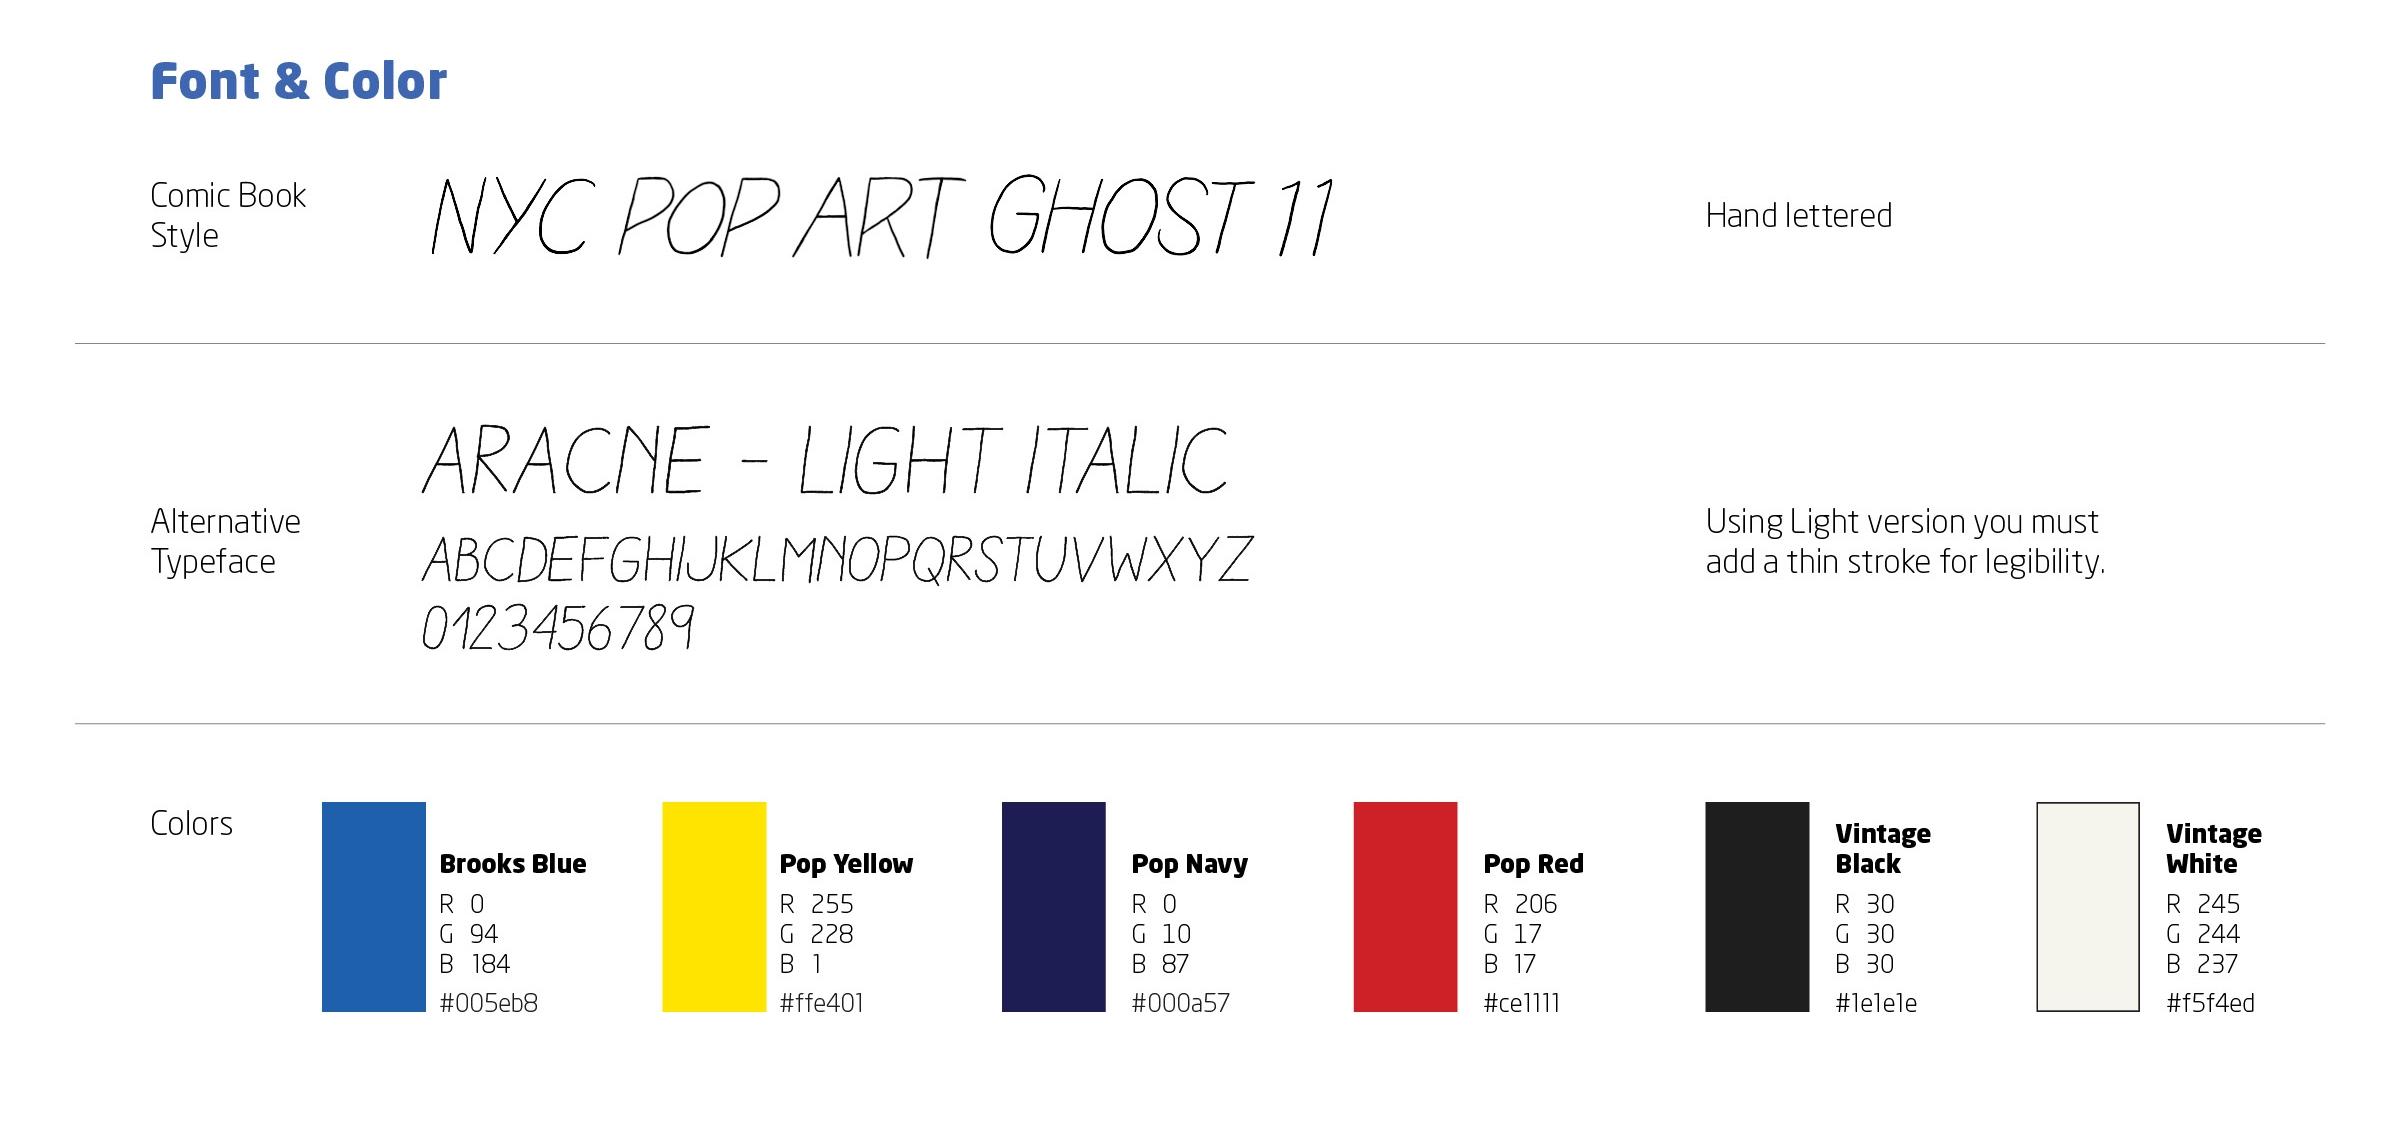 2018 NYCM Pop Art Ghost 11 Creative Guide19.jpg